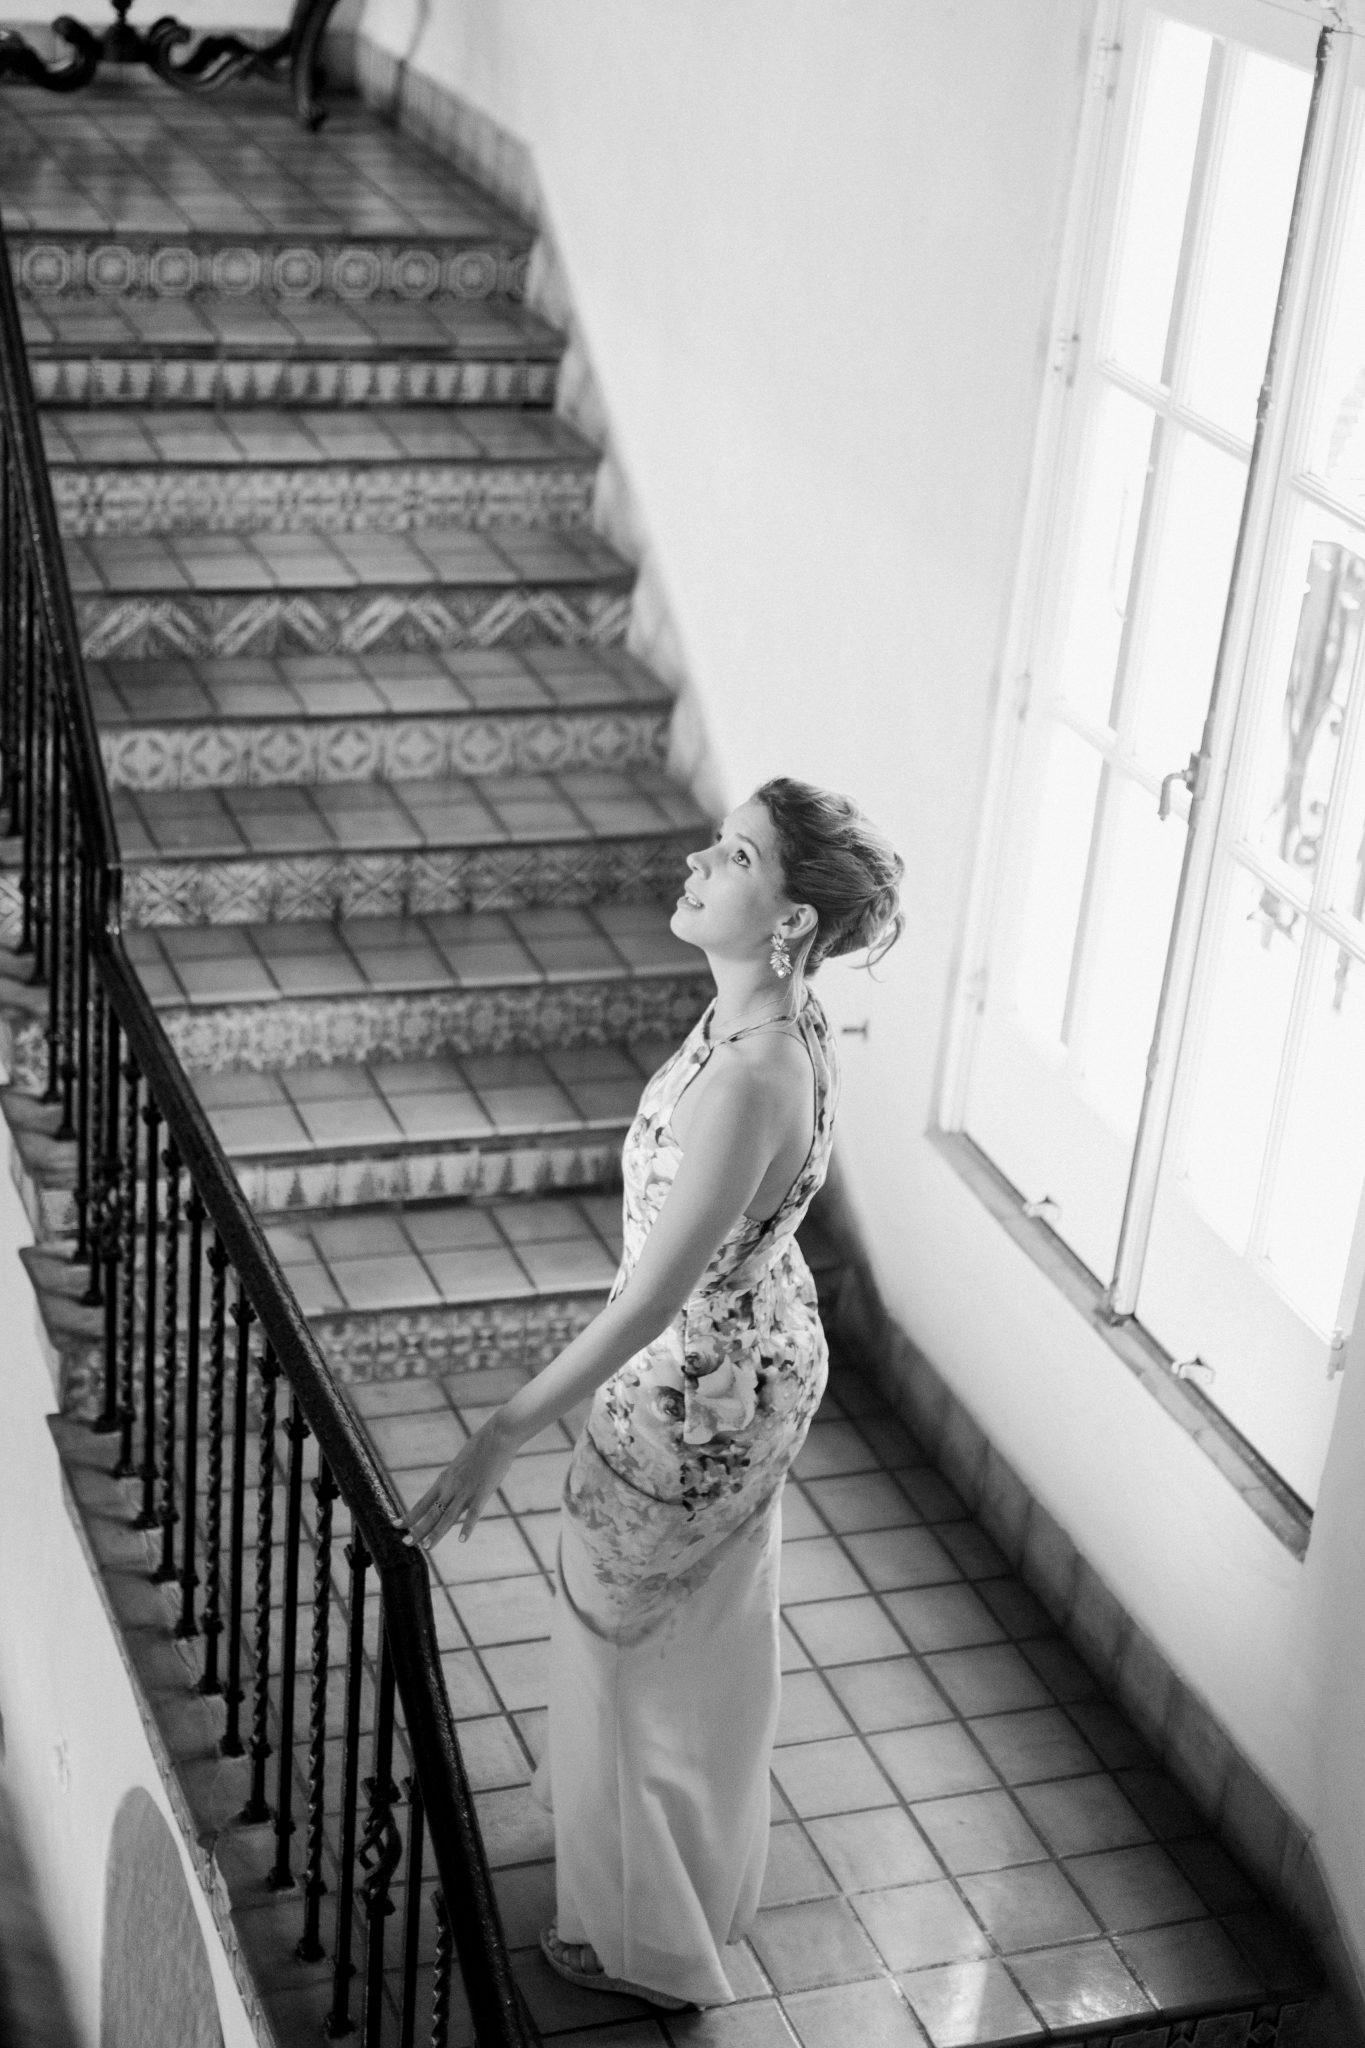 photos mariage paris fontainebleau miami marine gomez photographie